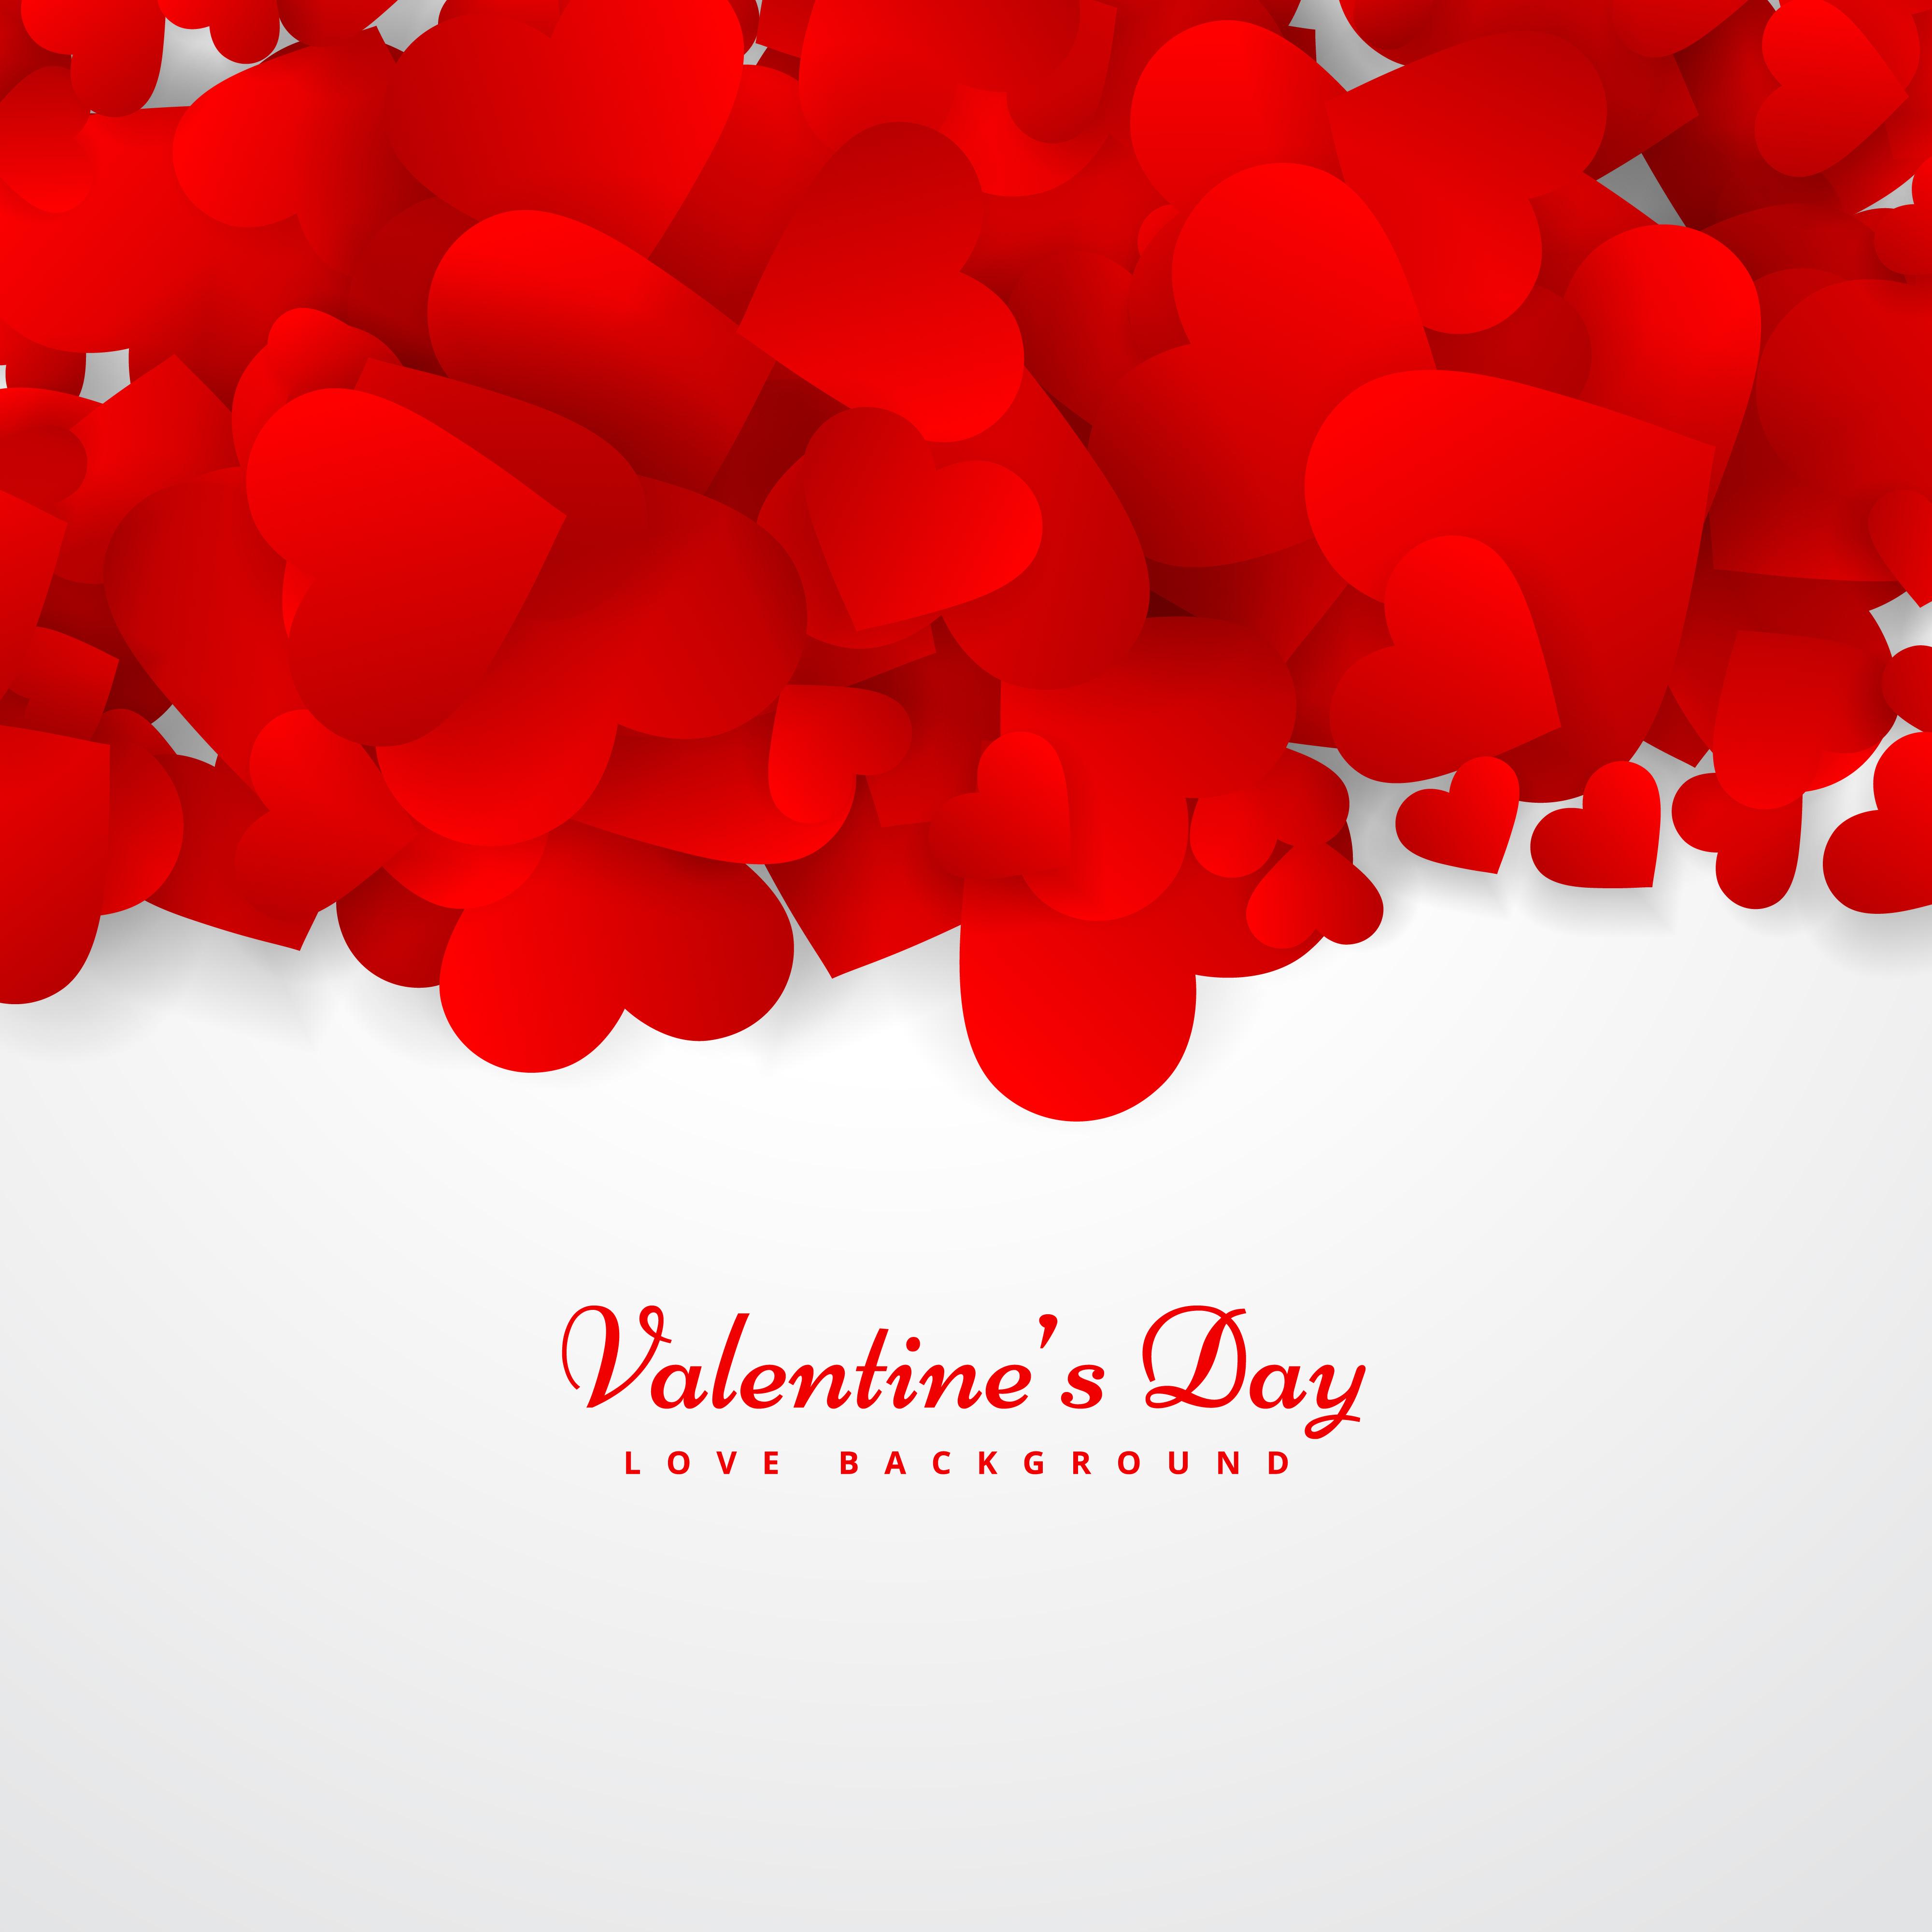 Valentines Day Greeting Card Vector Design Illustration